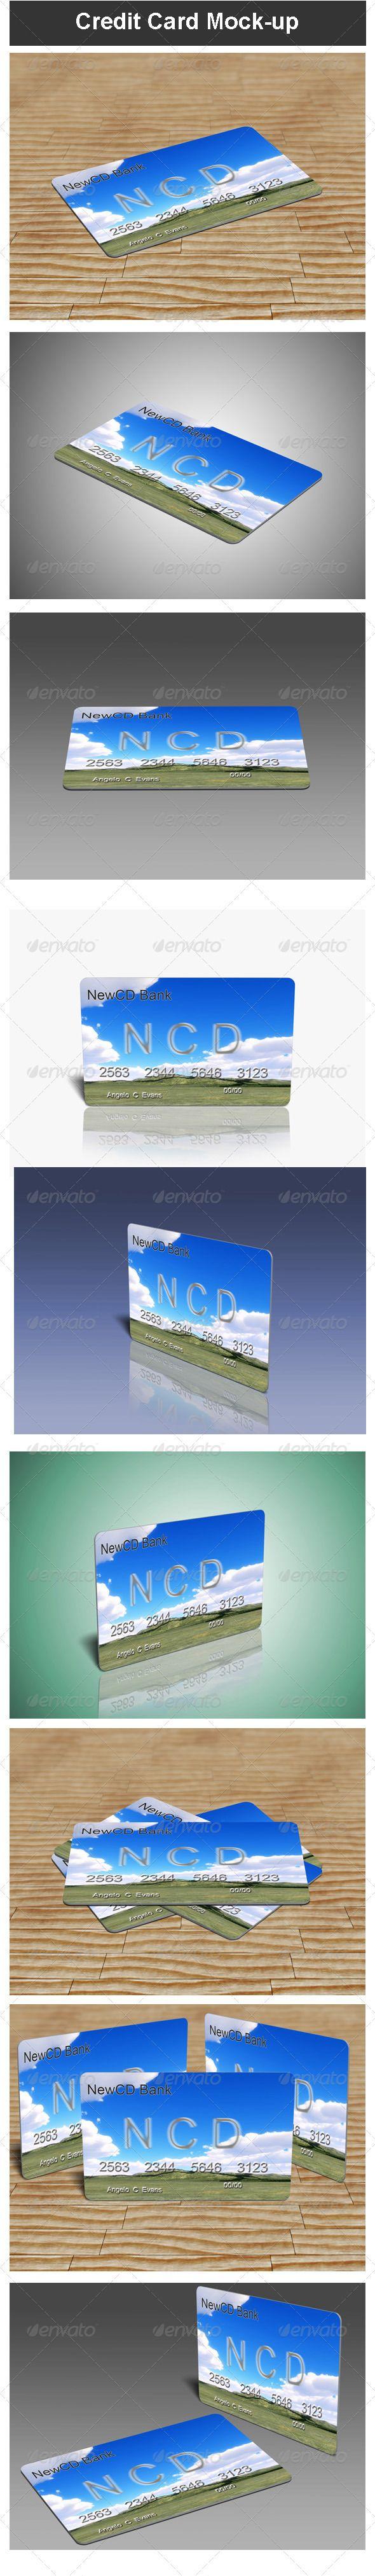 credit card logos high resolution